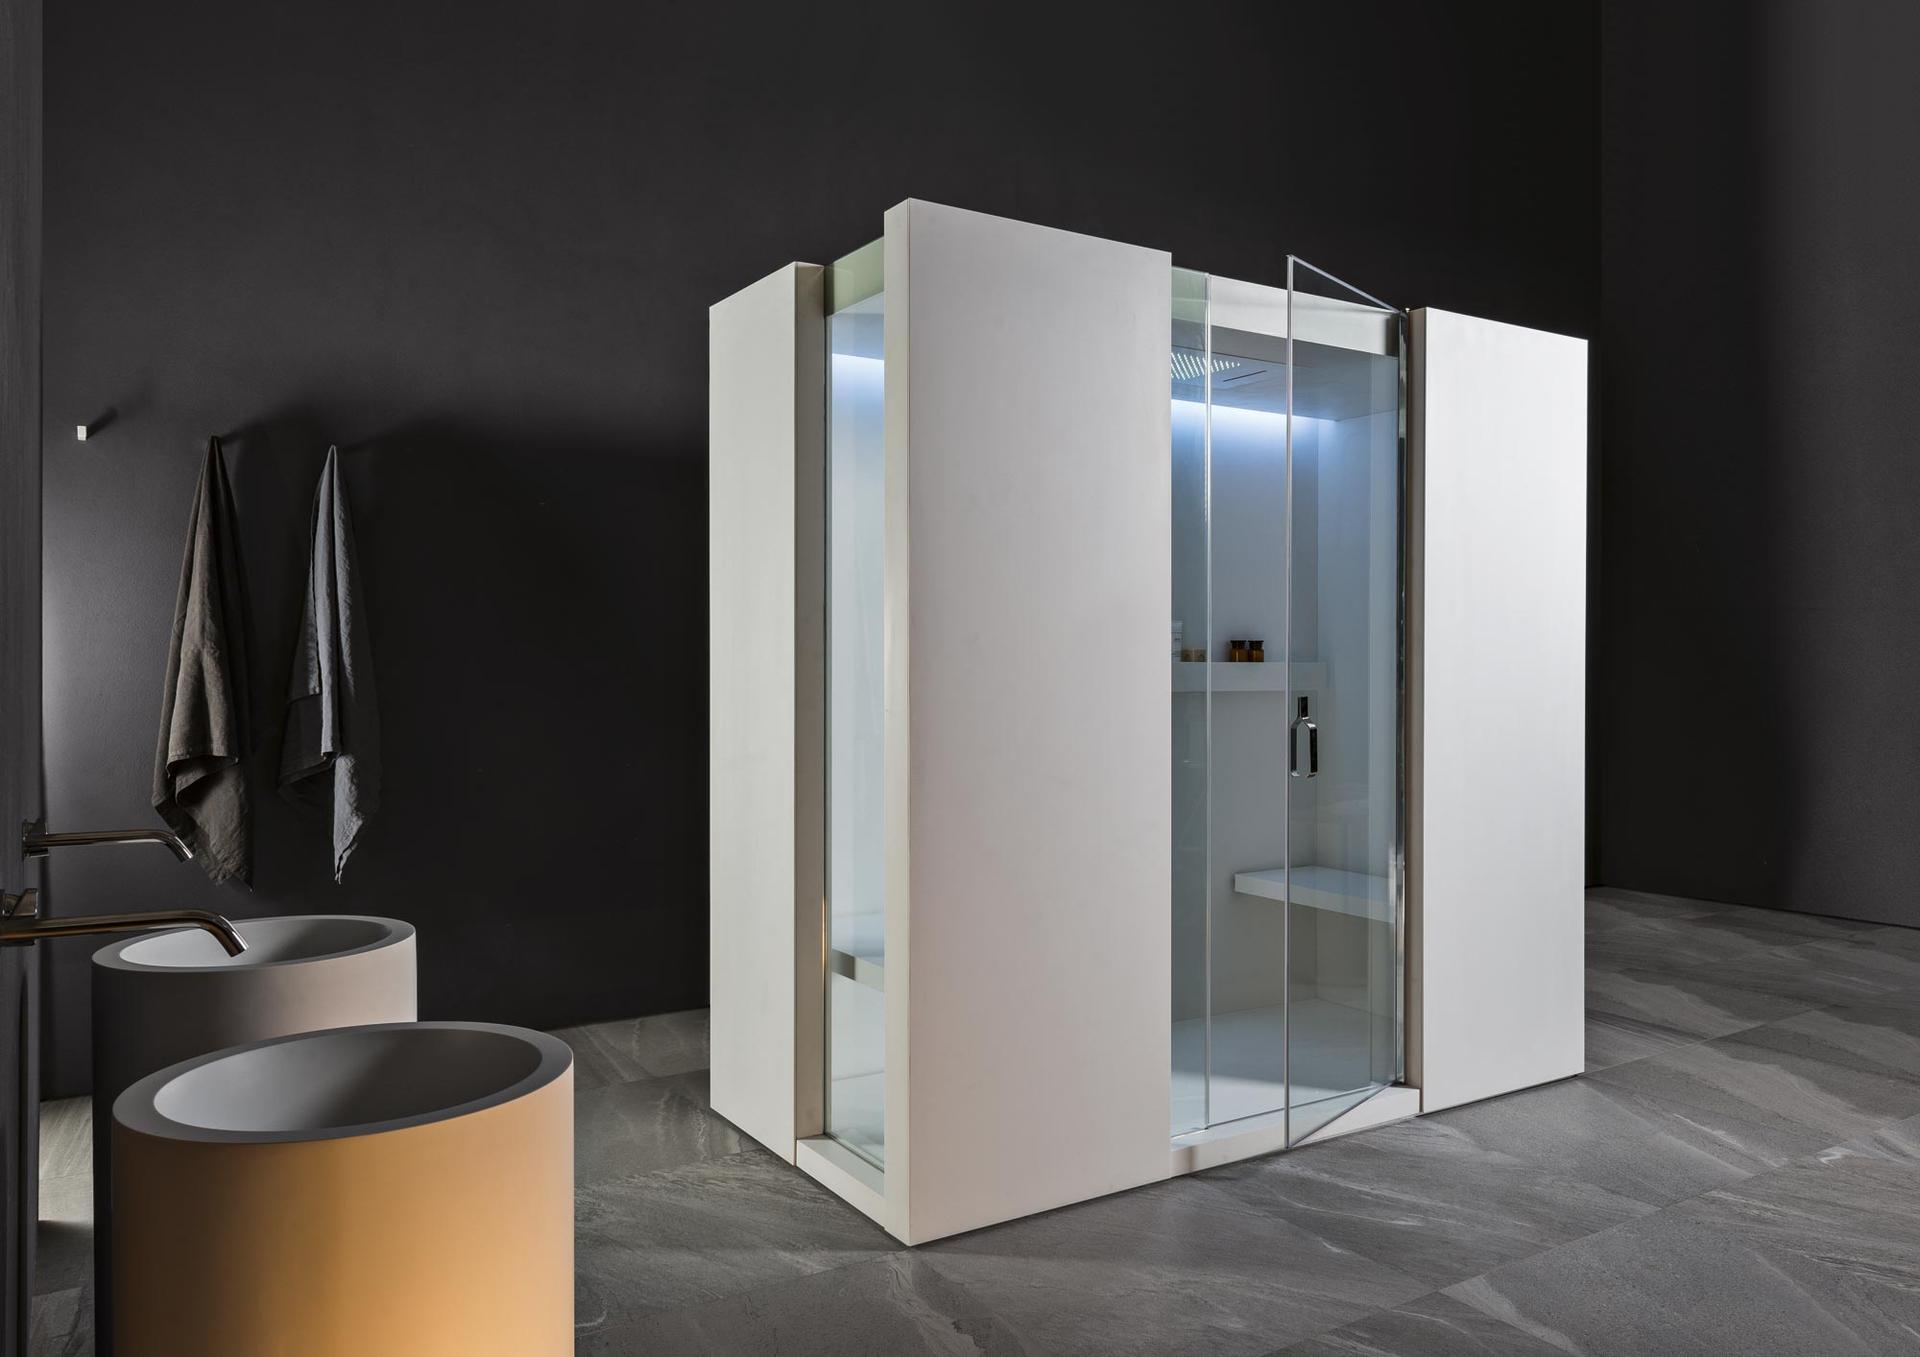 designer badm bel von makro exklusiv bei badart. Black Bedroom Furniture Sets. Home Design Ideas